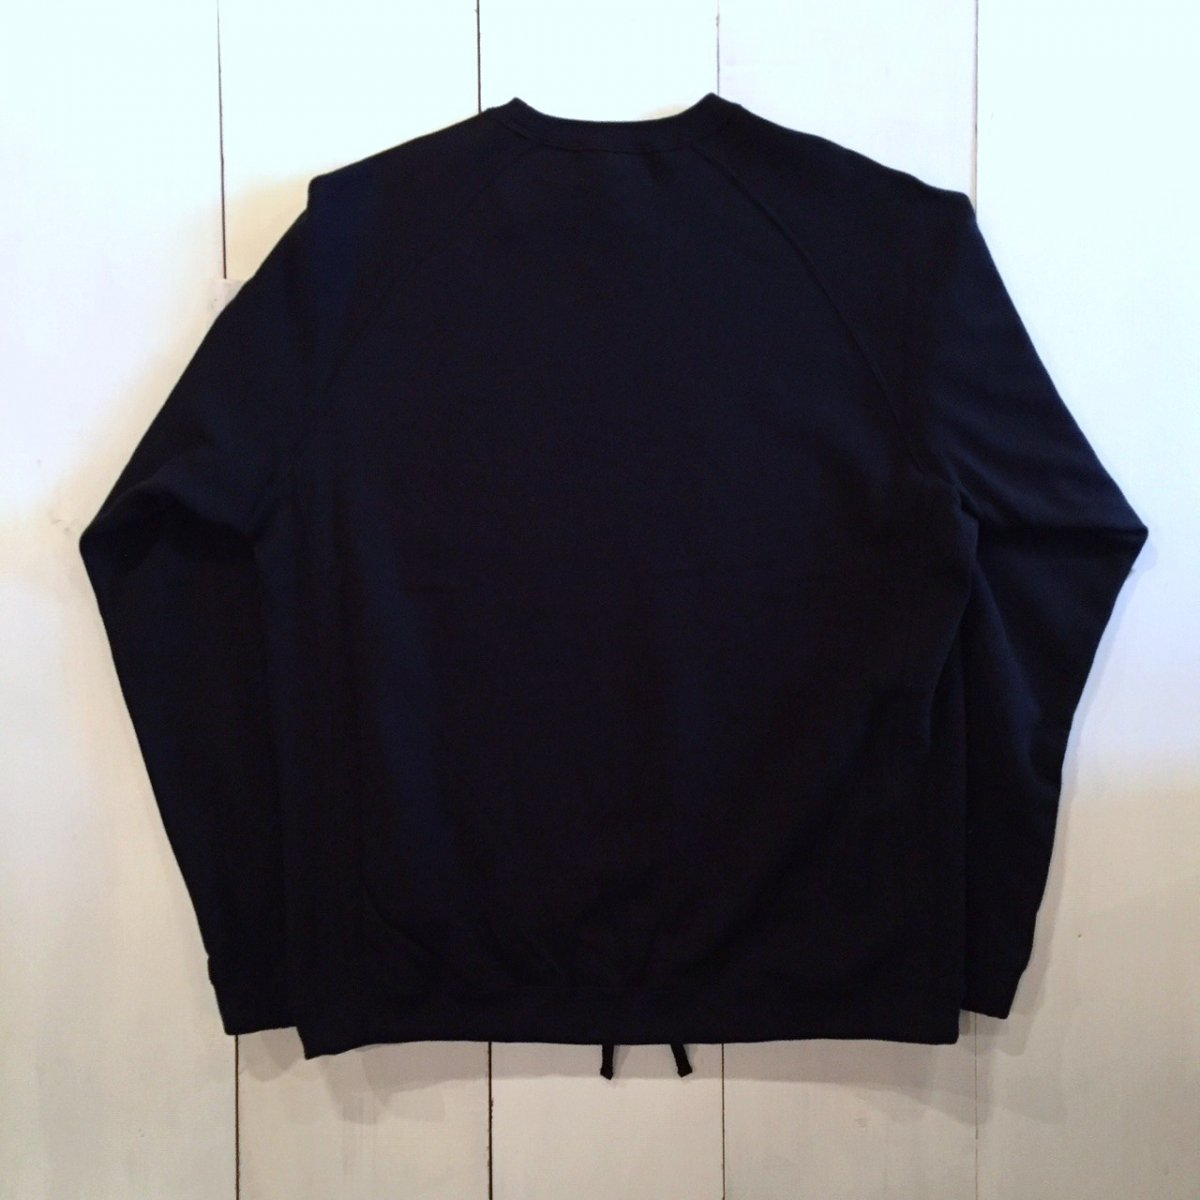 <img class='new_mark_img1' src='https://img.shop-pro.jp/img/new/icons3.gif' style='border:none;display:inline;margin:0px;padding:0px;width:auto;' />Black Weirdos  ブラック ウィドー / スウェットパーカ CrewNeck Sweatshirt 【BLACK】